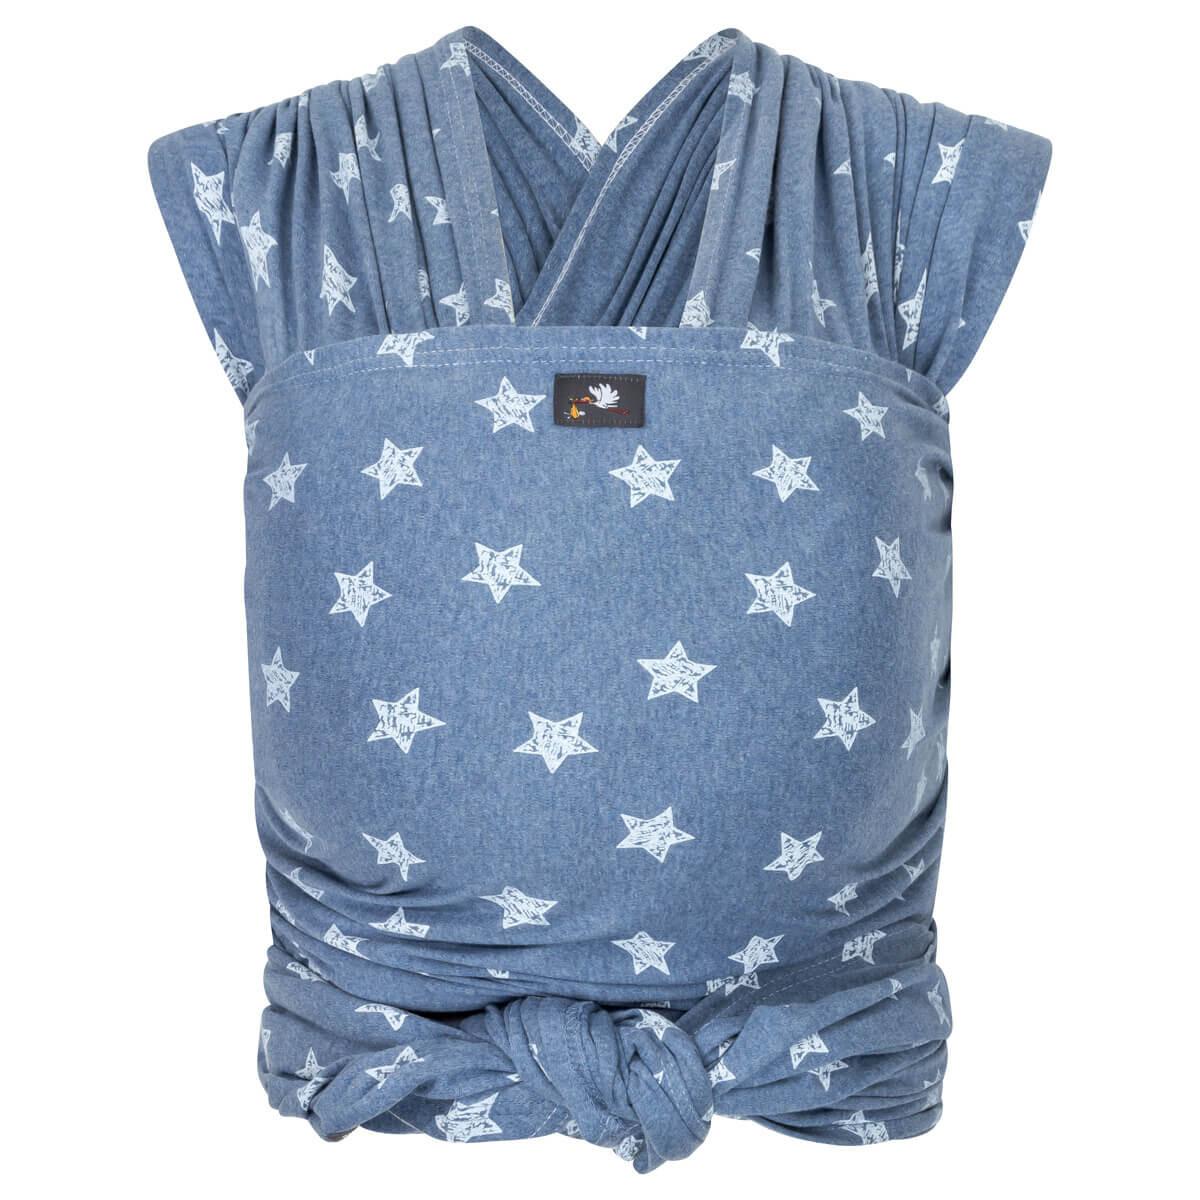 HOP-TYE ELASTĪGAIS SLINGS- blue stars